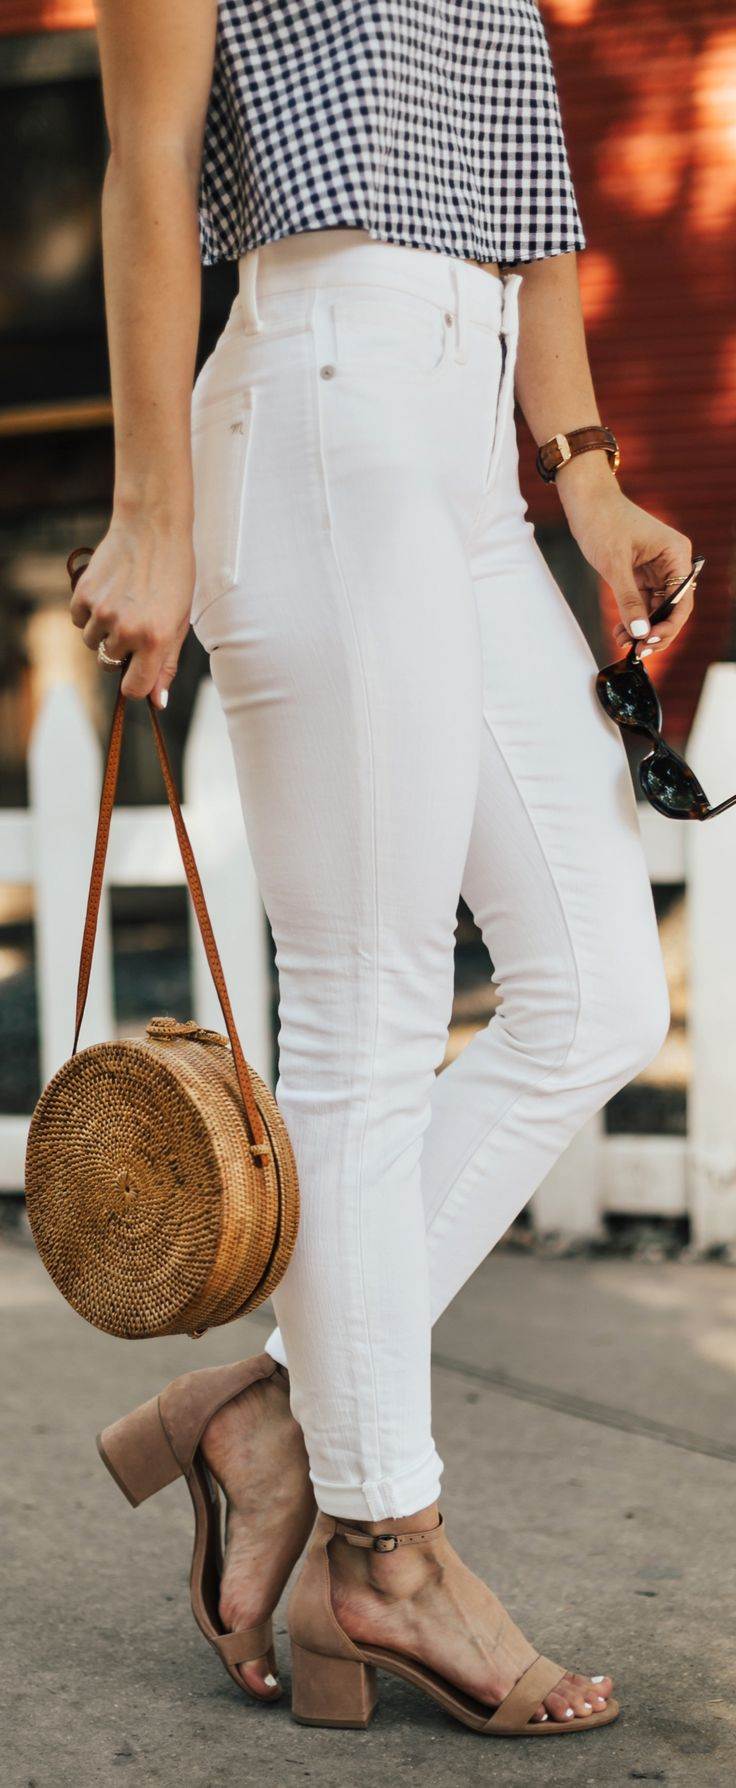 Gingham Tank & Round Straw Handbag | LivvyLand